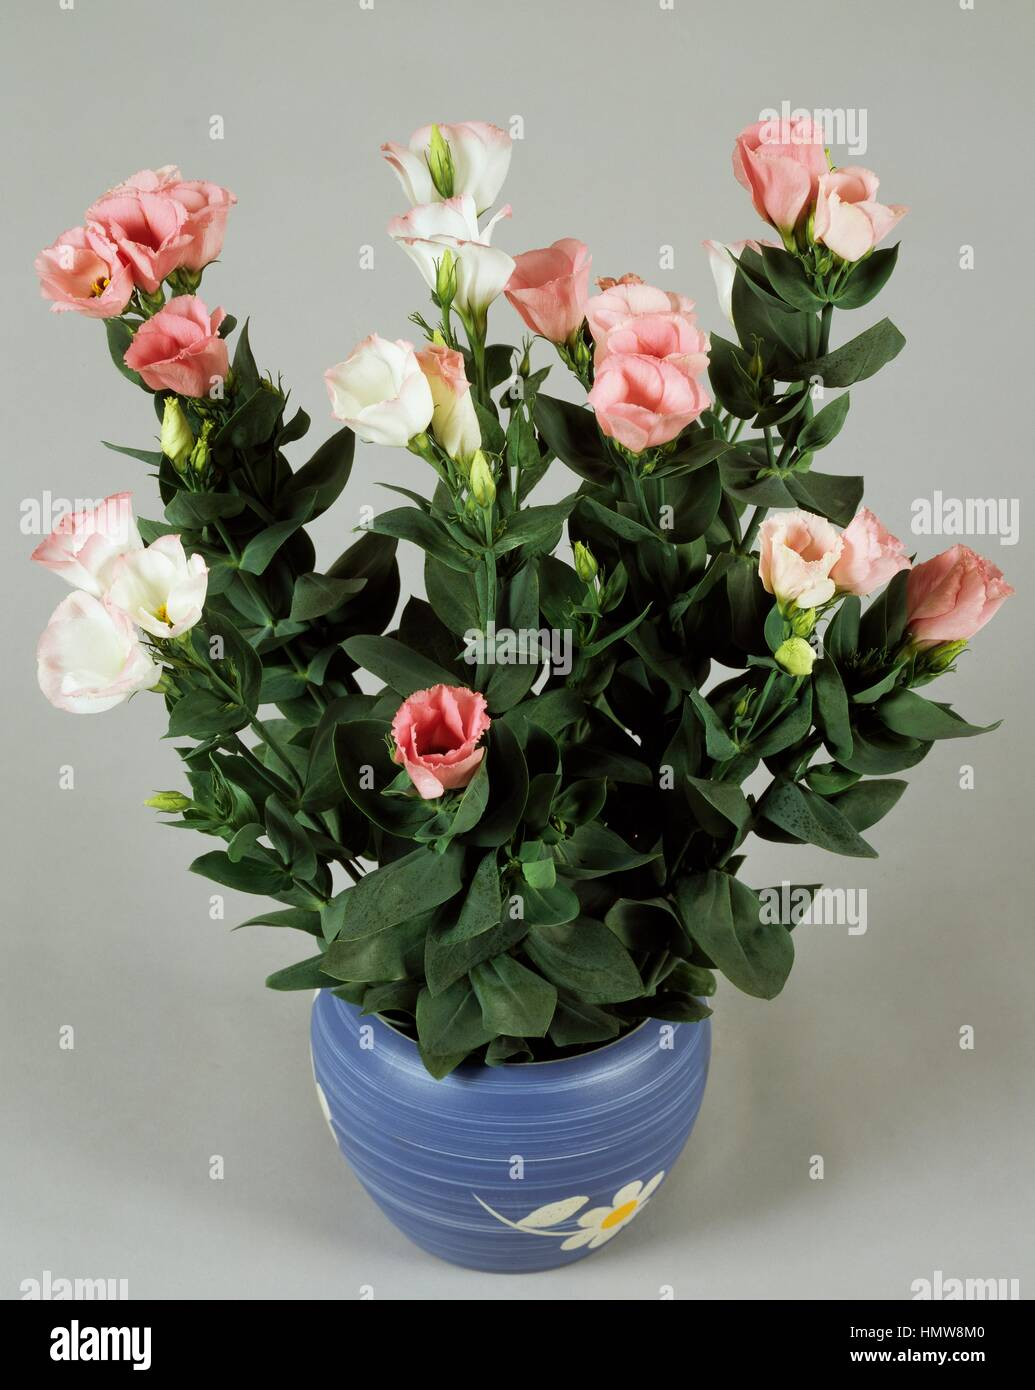 Texas bluebells, texas bluebell (Eustoma rosa Grandiflorum), Gentianaceae. - Stock Image